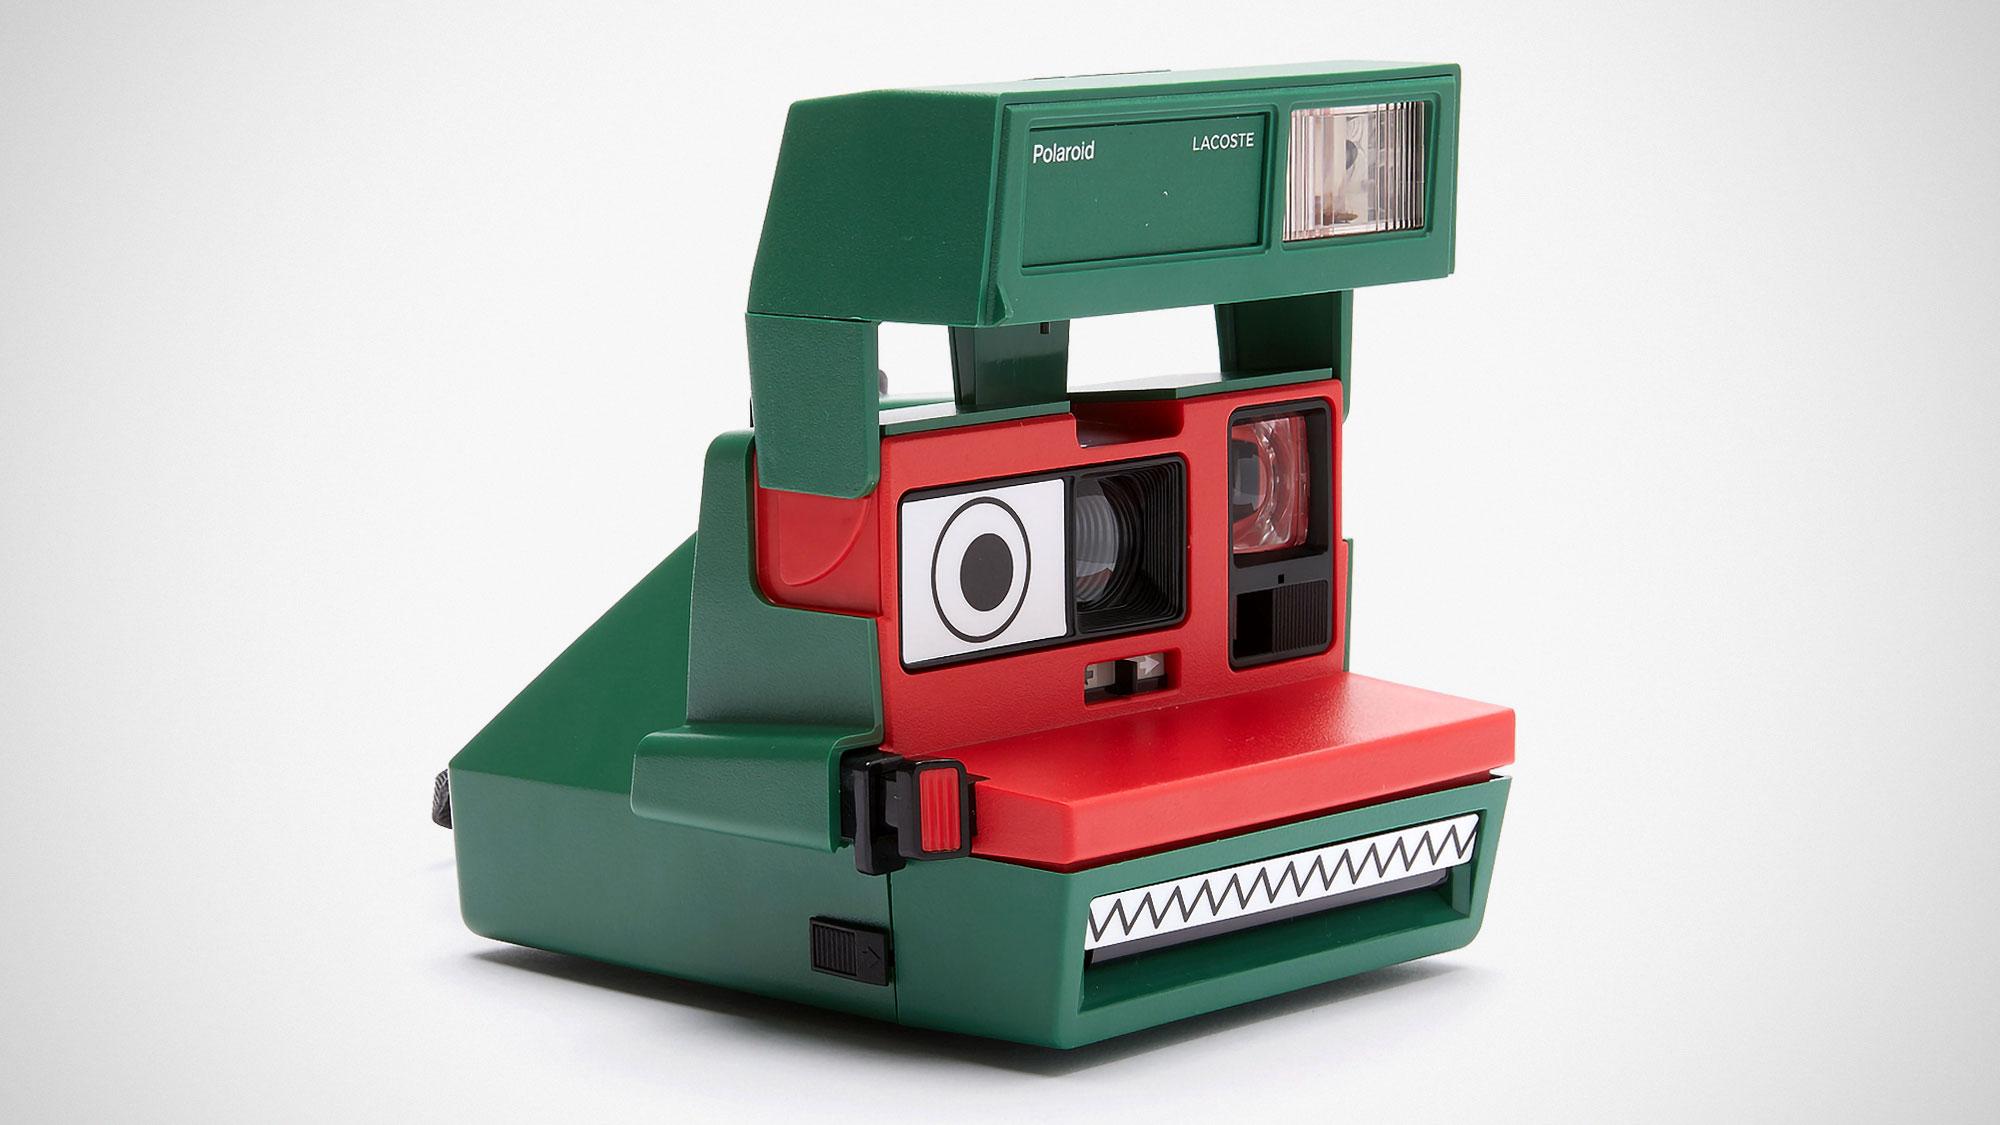 Lacoste x Polaroid 600 Instant Camera